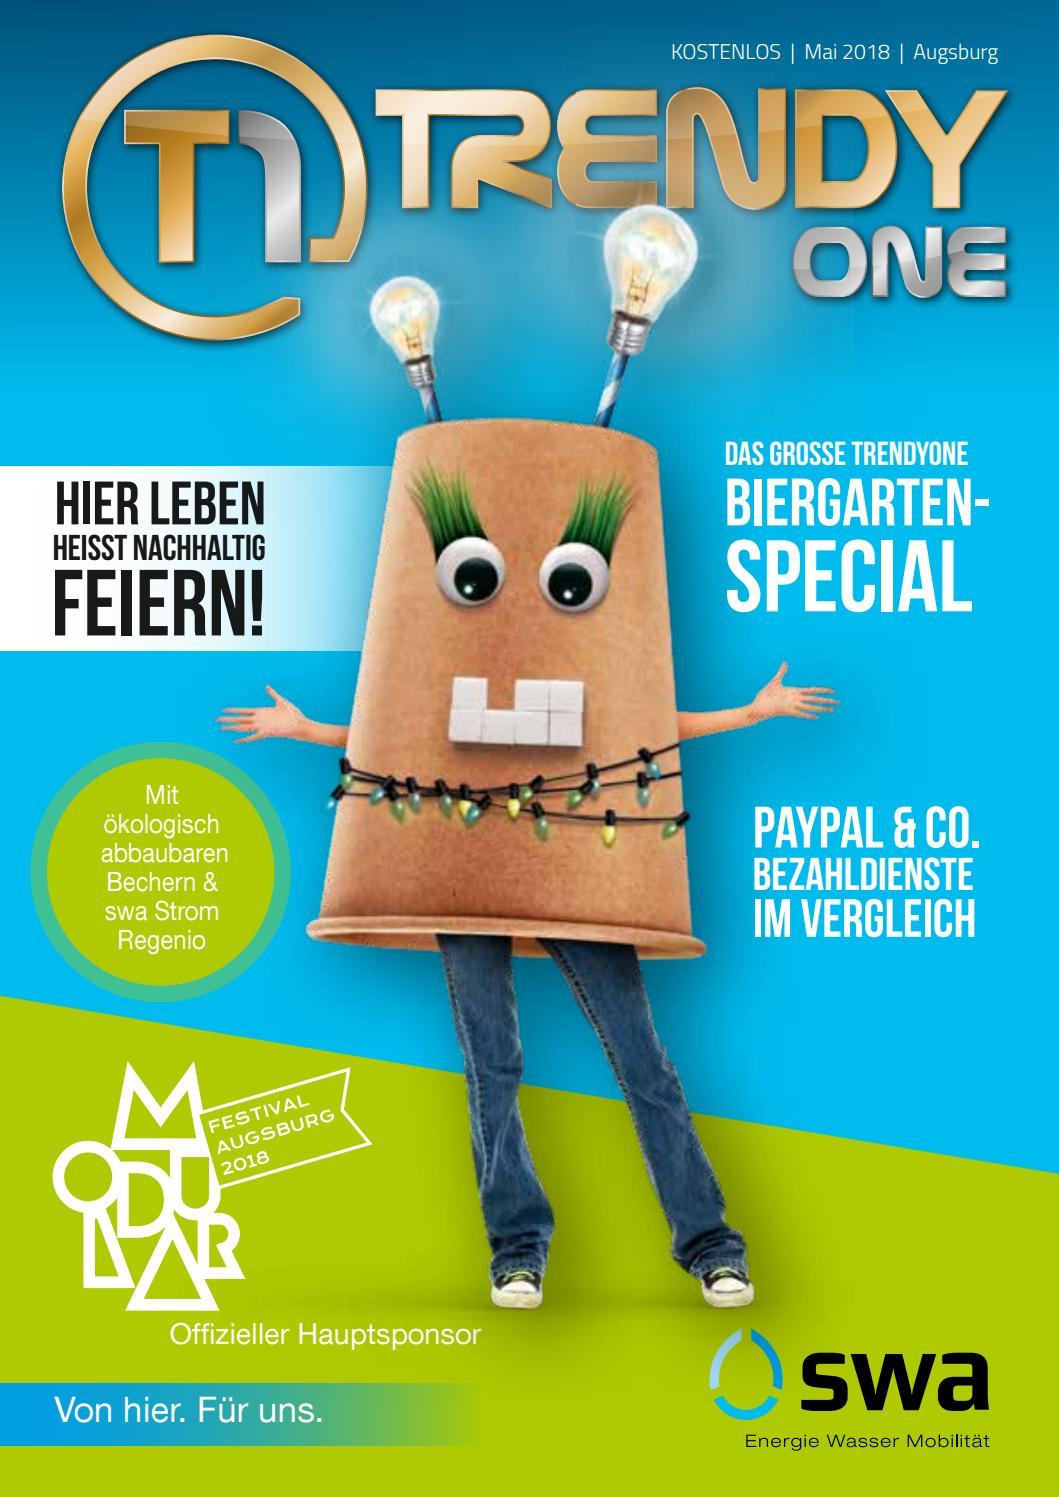 TRENDYone | Das Magazin - Augsburg - Mai 2018 by ad can do GmbH & Co. KG -  issuu